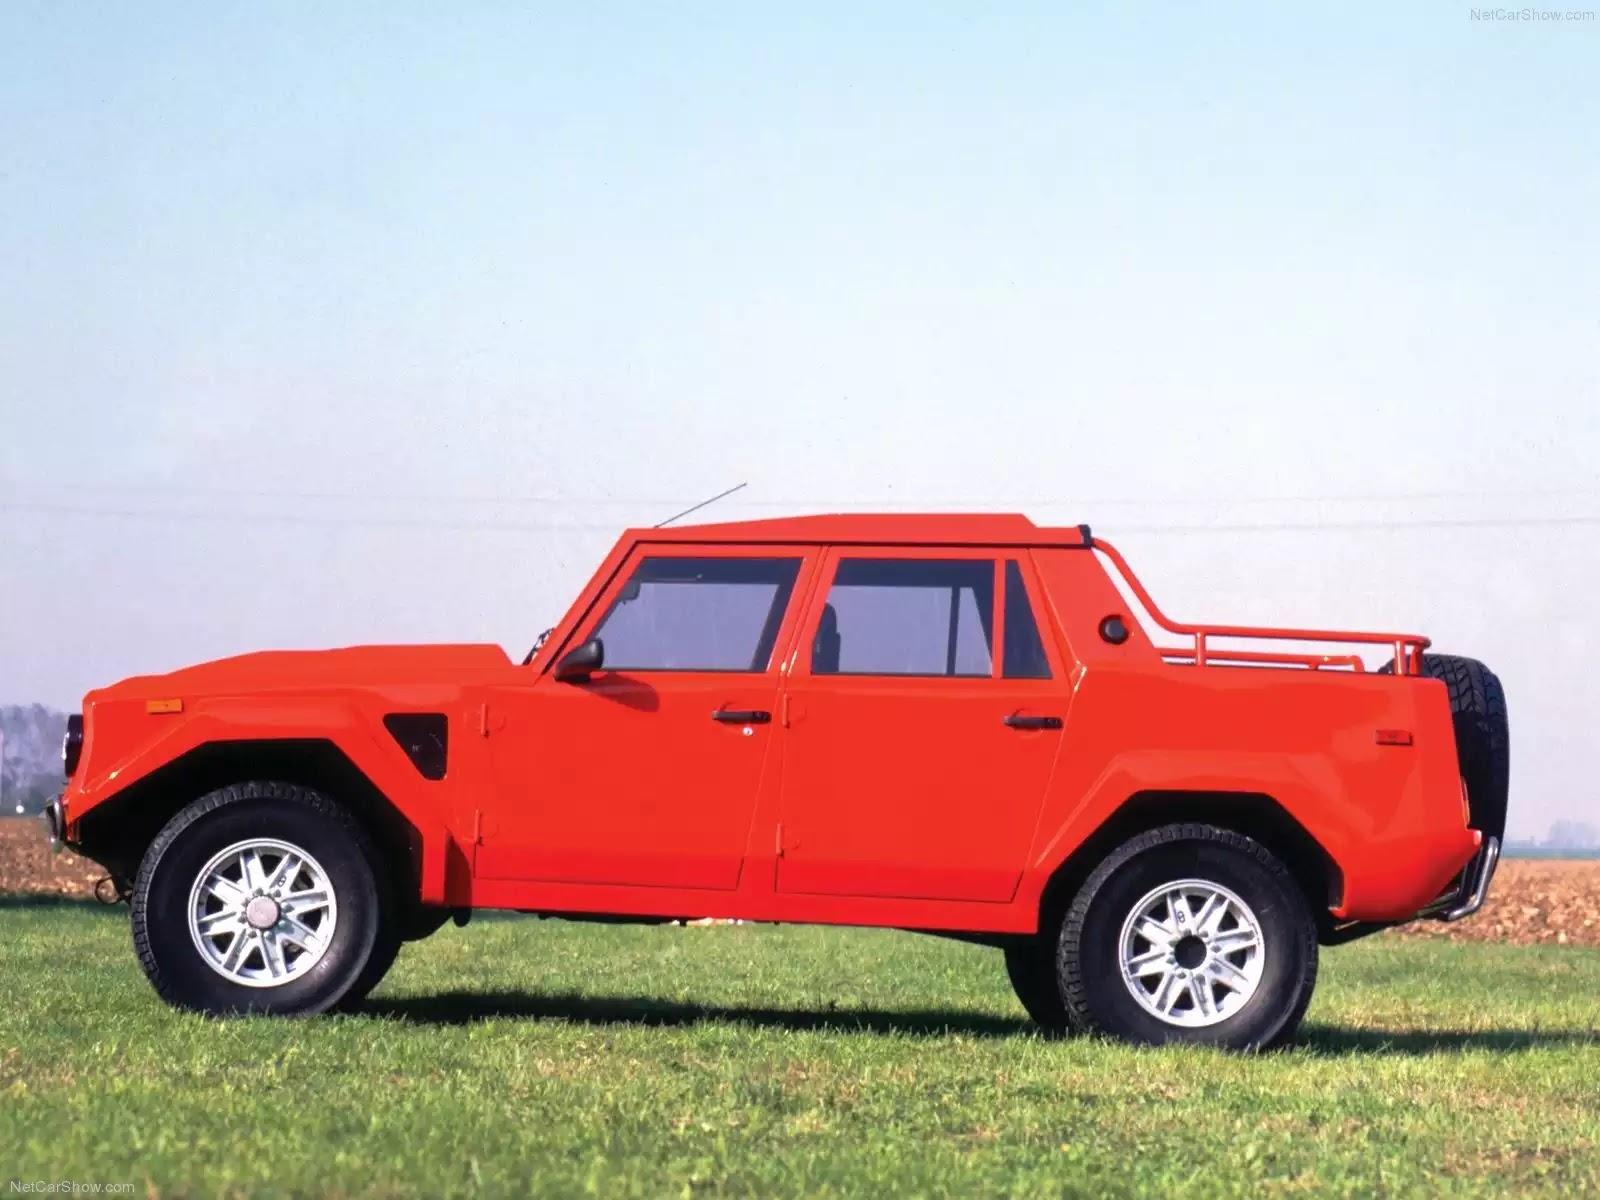 Hình ảnh siêu xe Lamborghini LM 1986 & nội ngoại thất